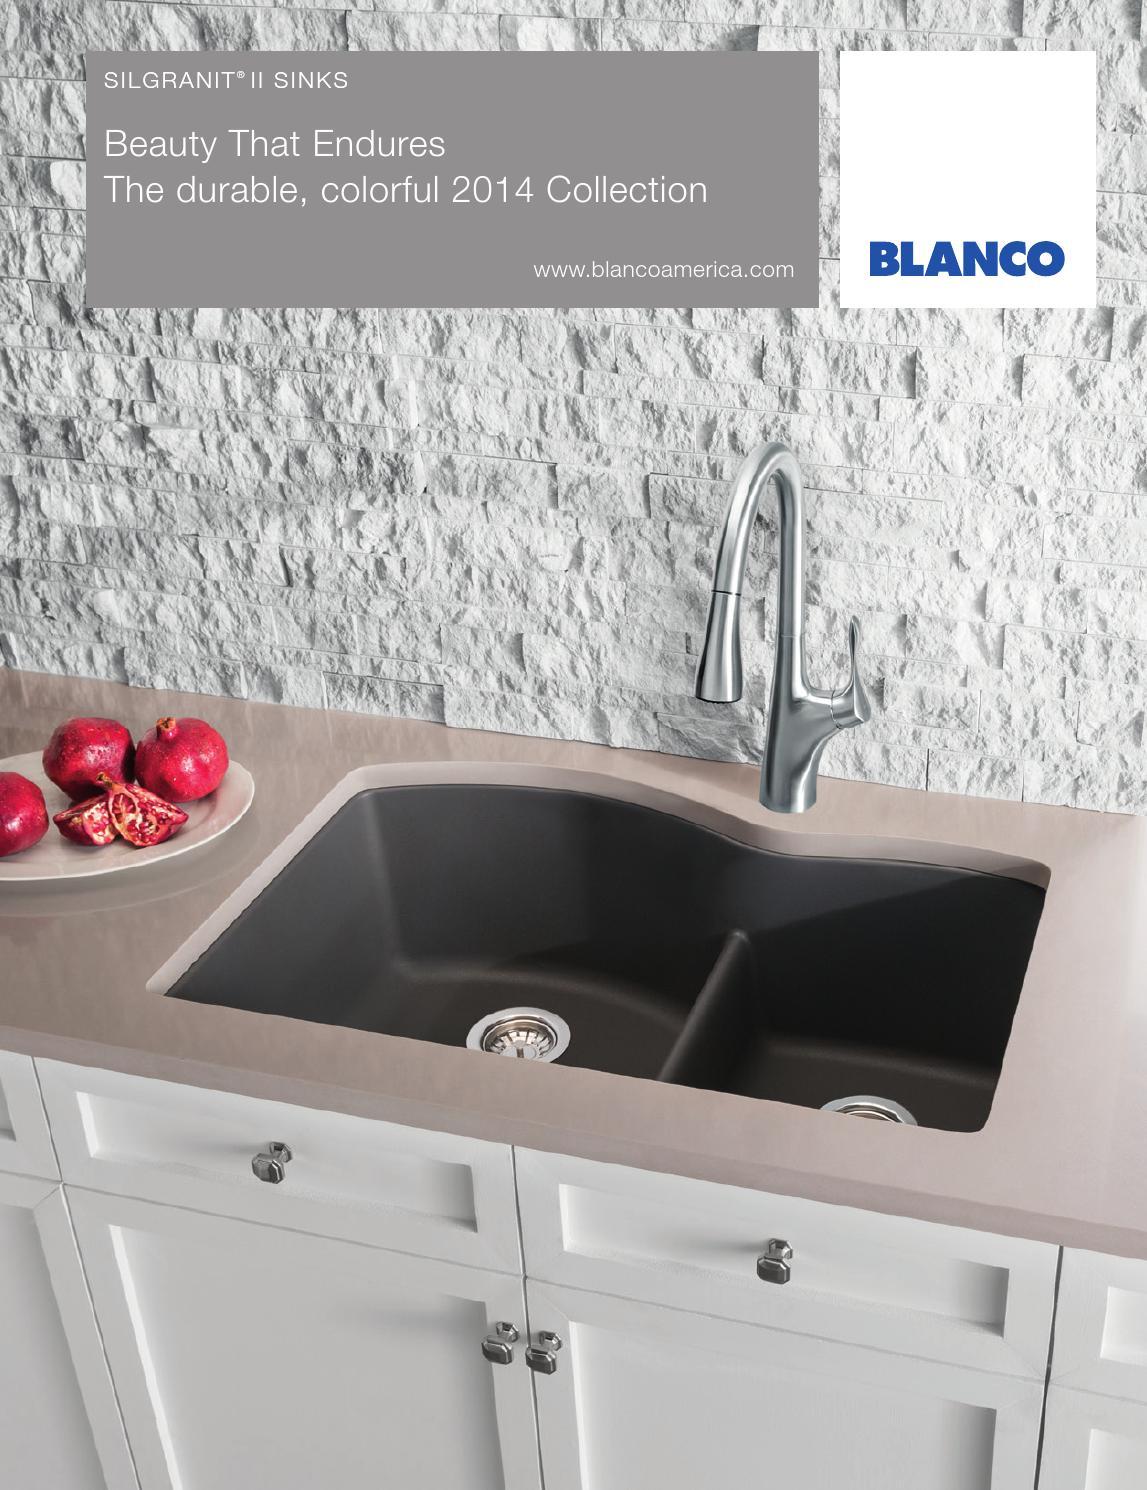 Blanco 2014 Silgranit Sink Brochure By Blanco Issuu